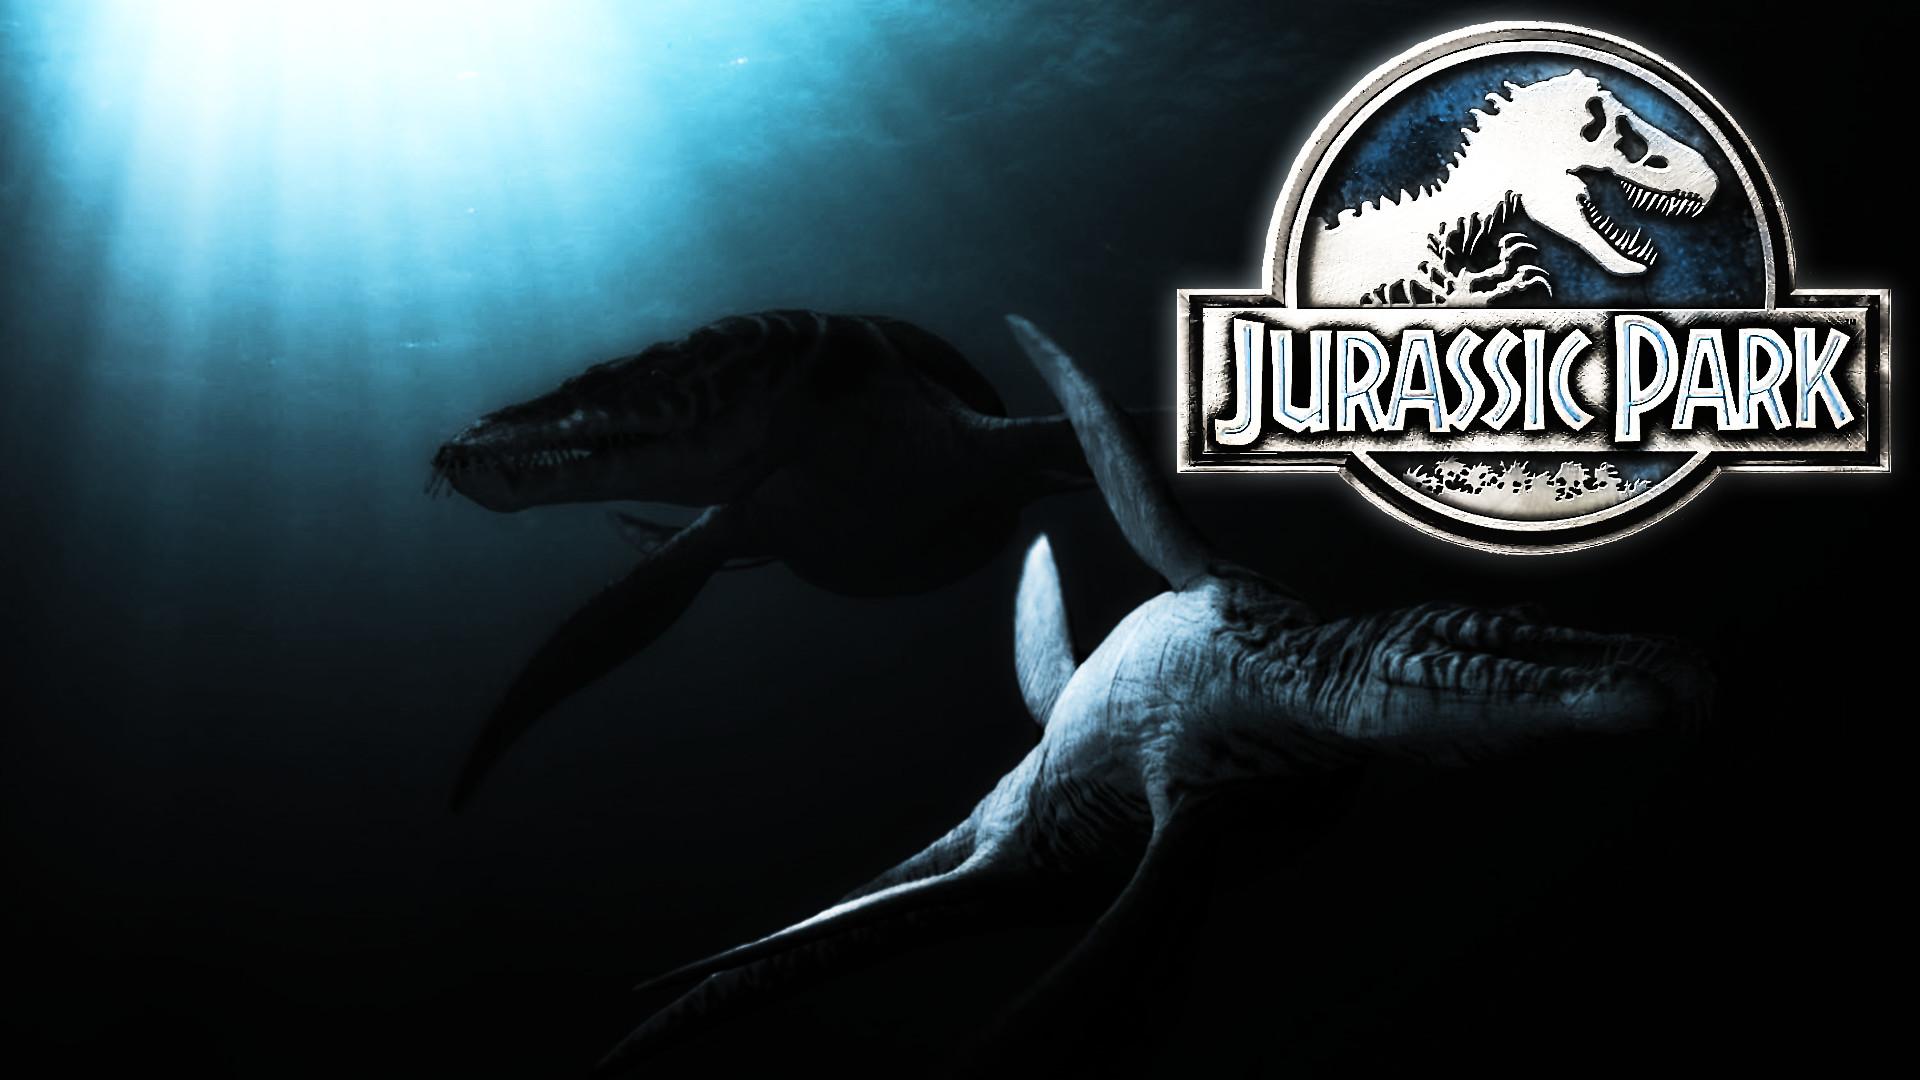 1440x2560 Jurassic Park Wallpaper - WallpaperSafari